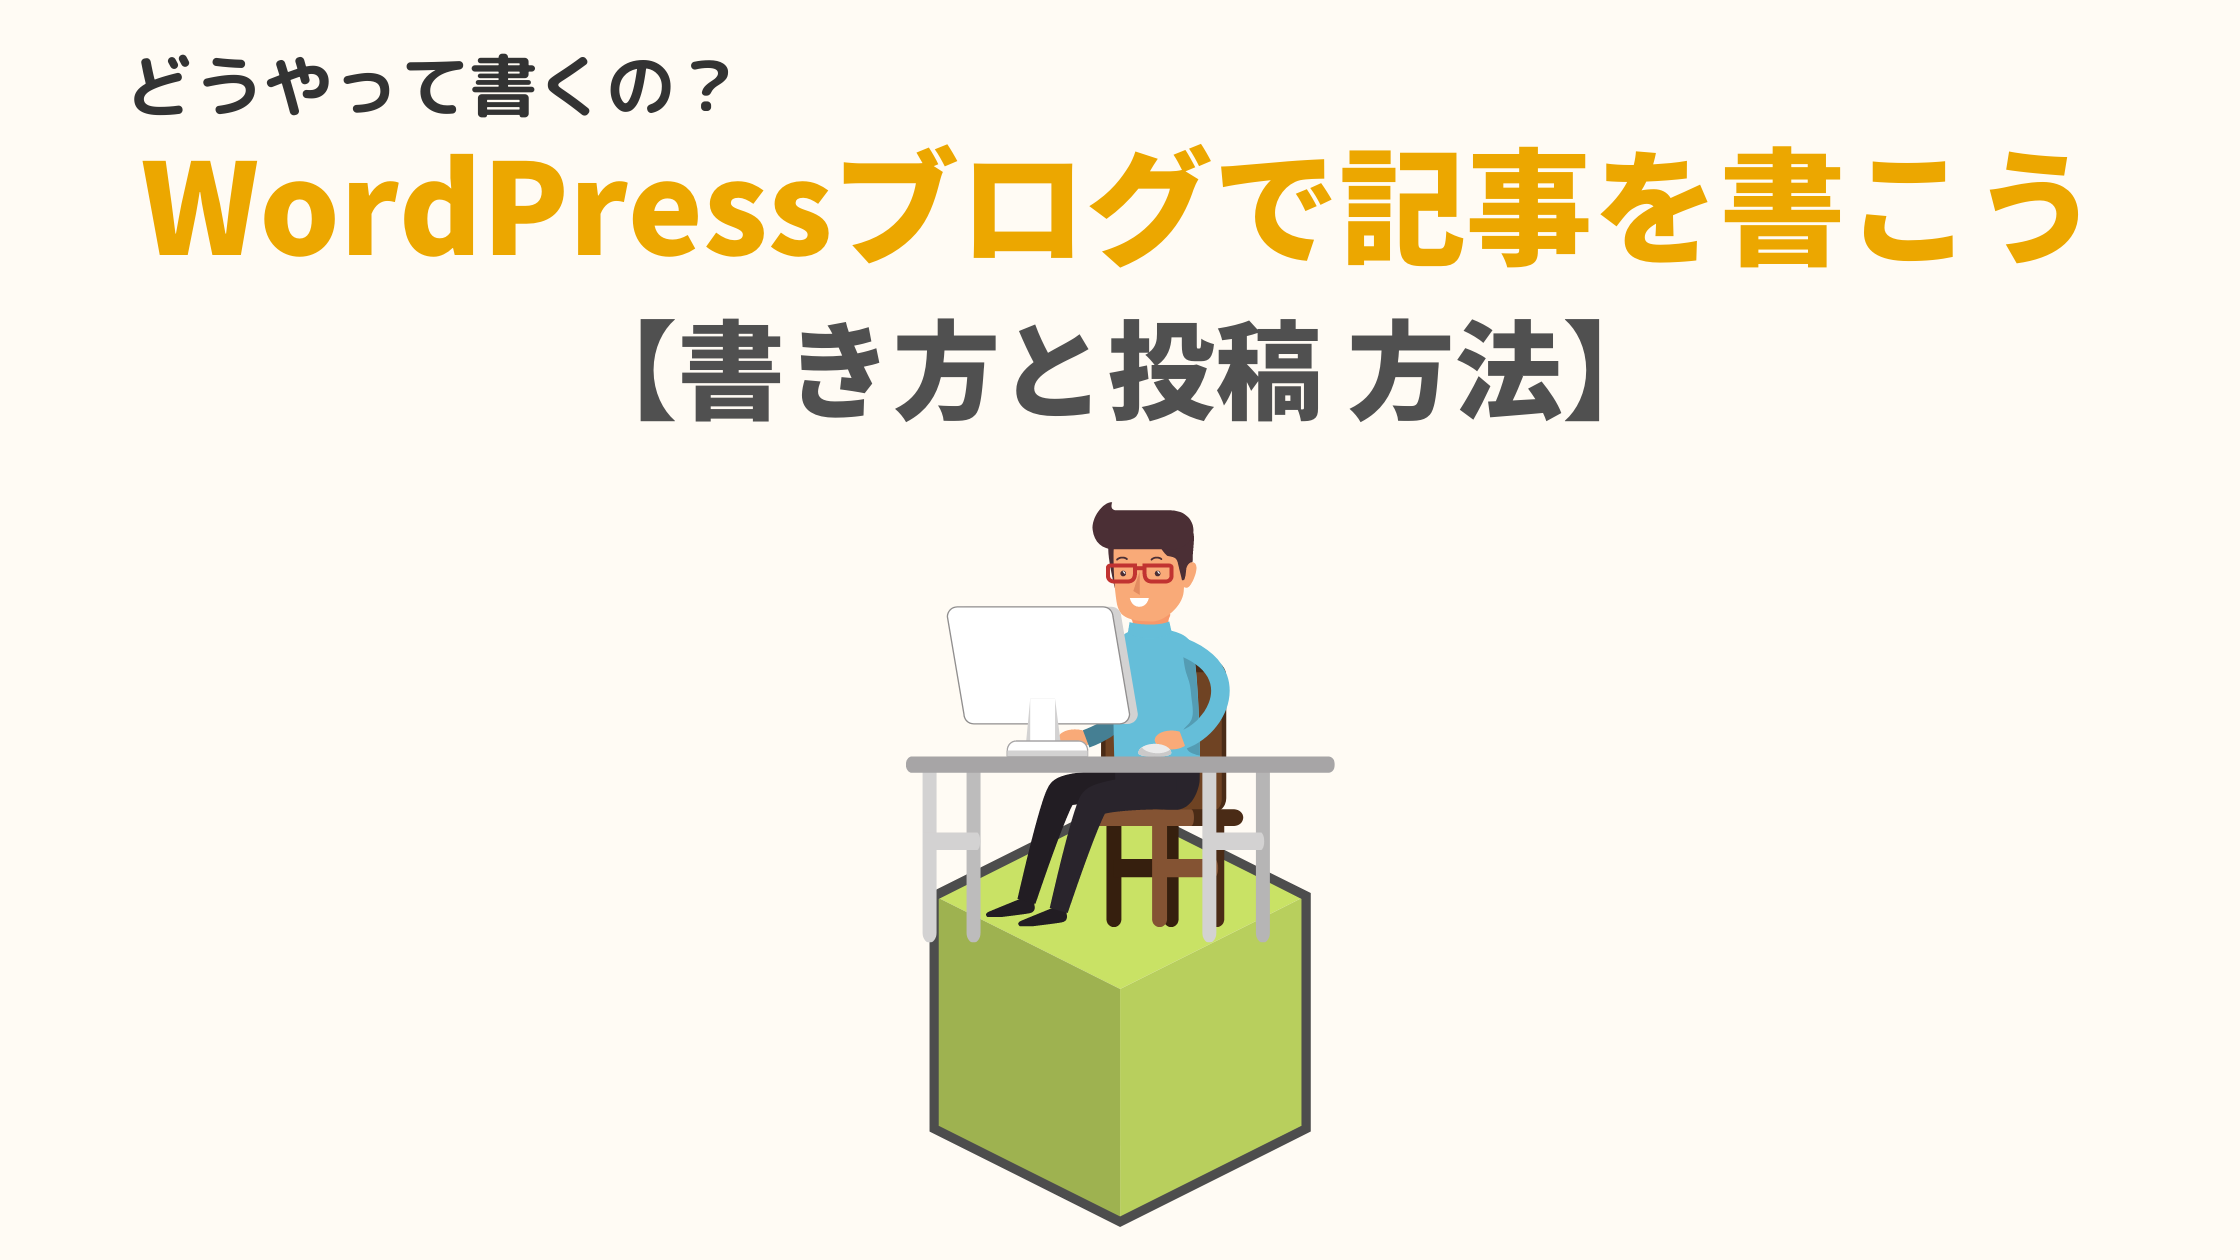 WordPressブログの書き方